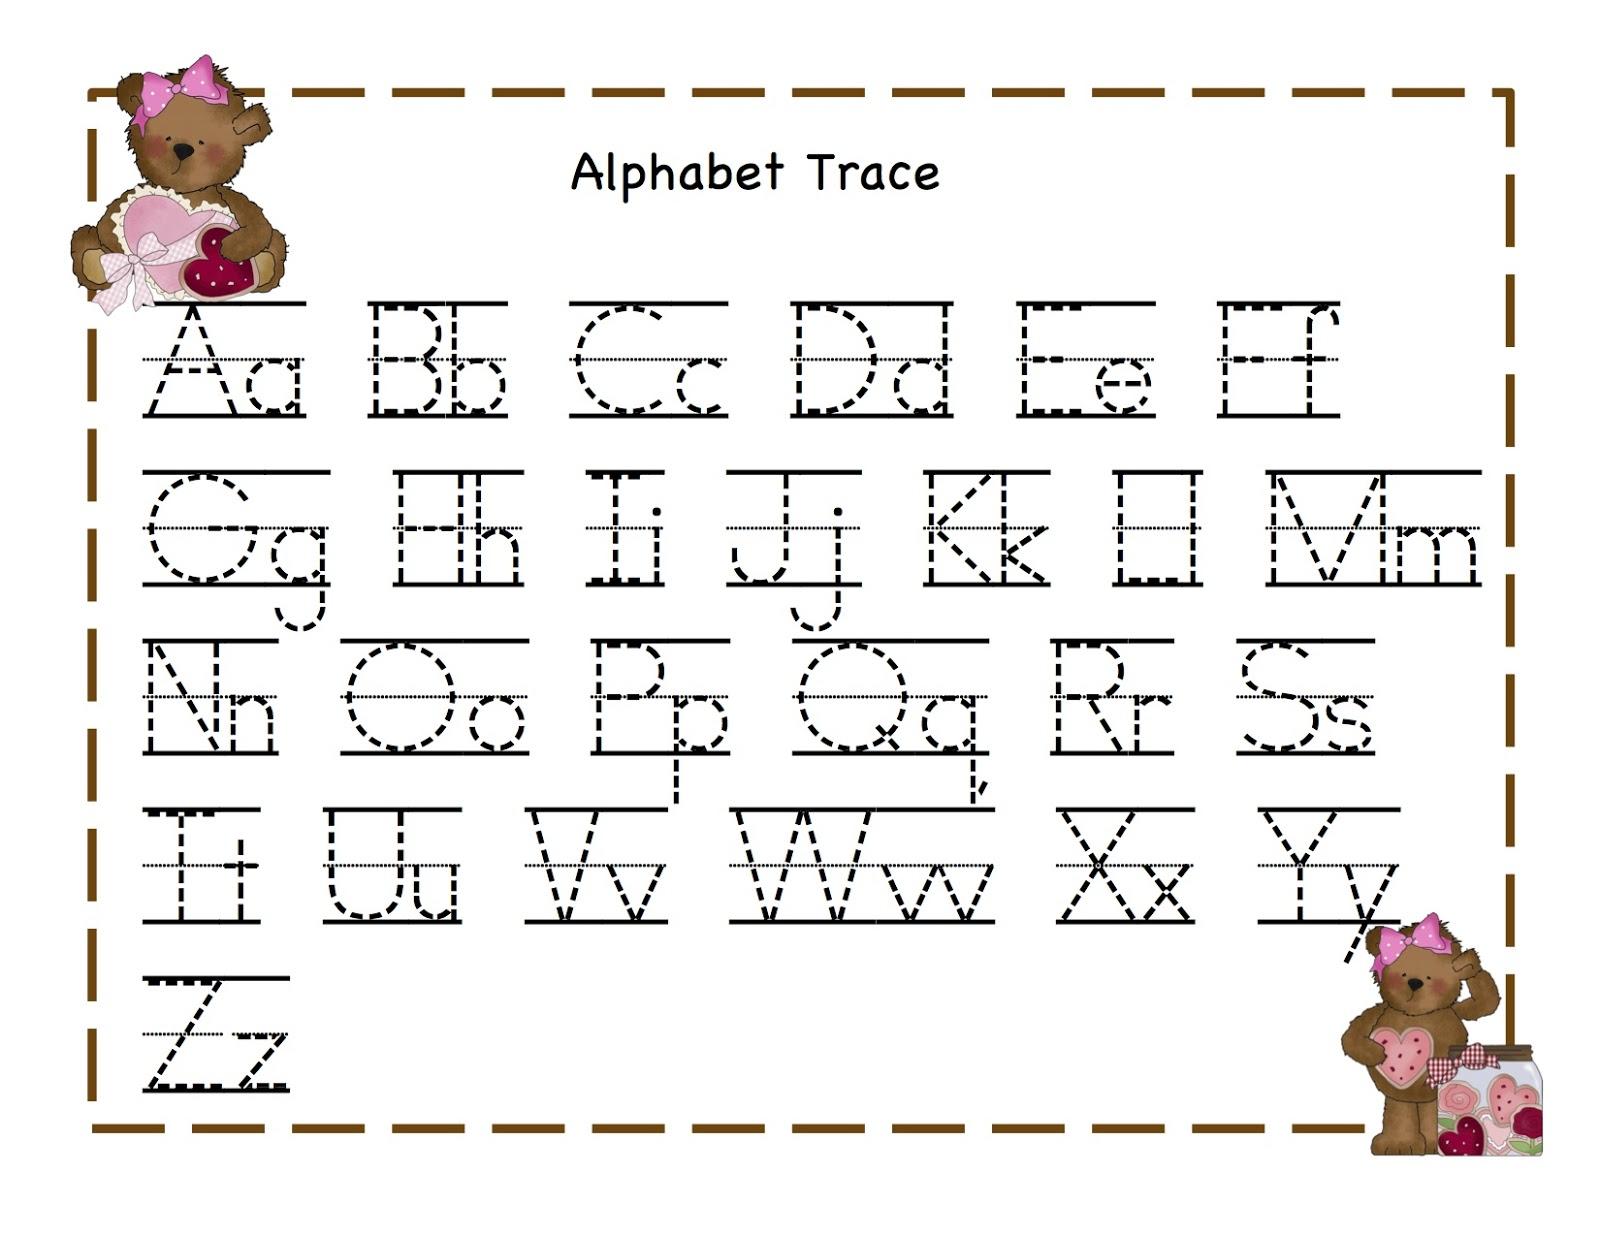 Worksheet Practice Letters For Preschoolers traceable alphabet worksheets for preschoolers letter tracing entire worksheet related keywords entire